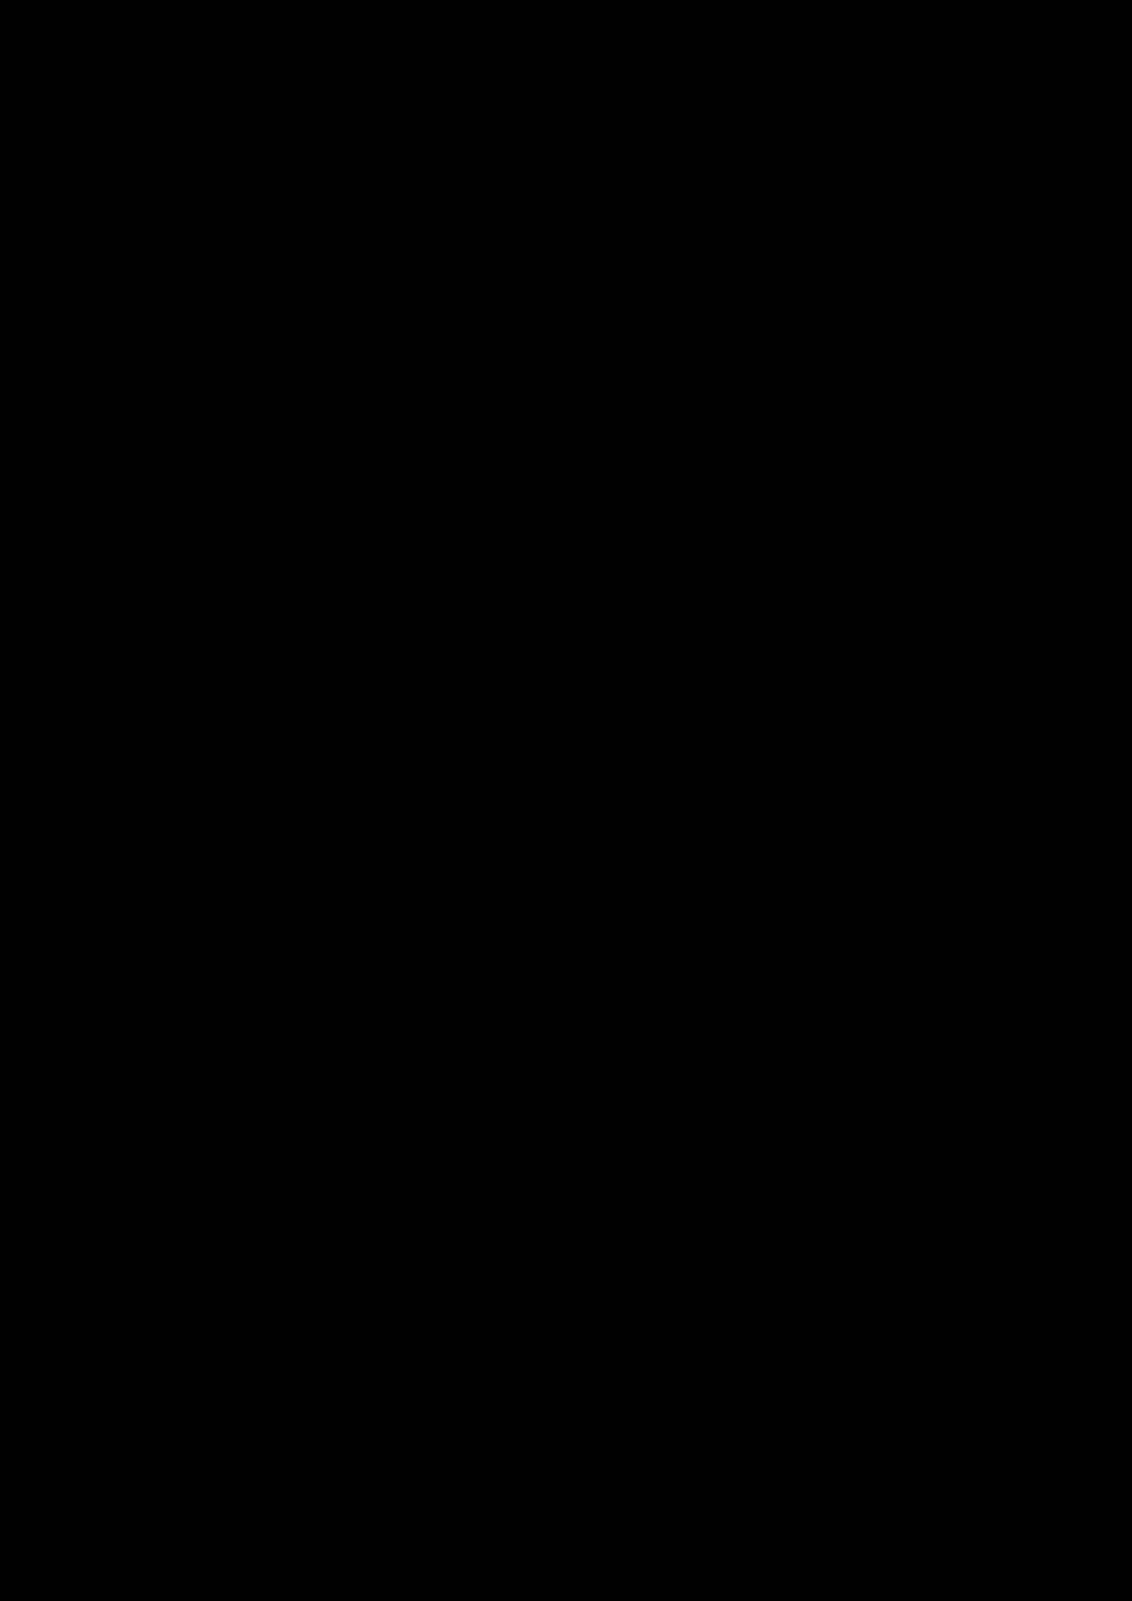 Ten lyubvi slide, Image 55